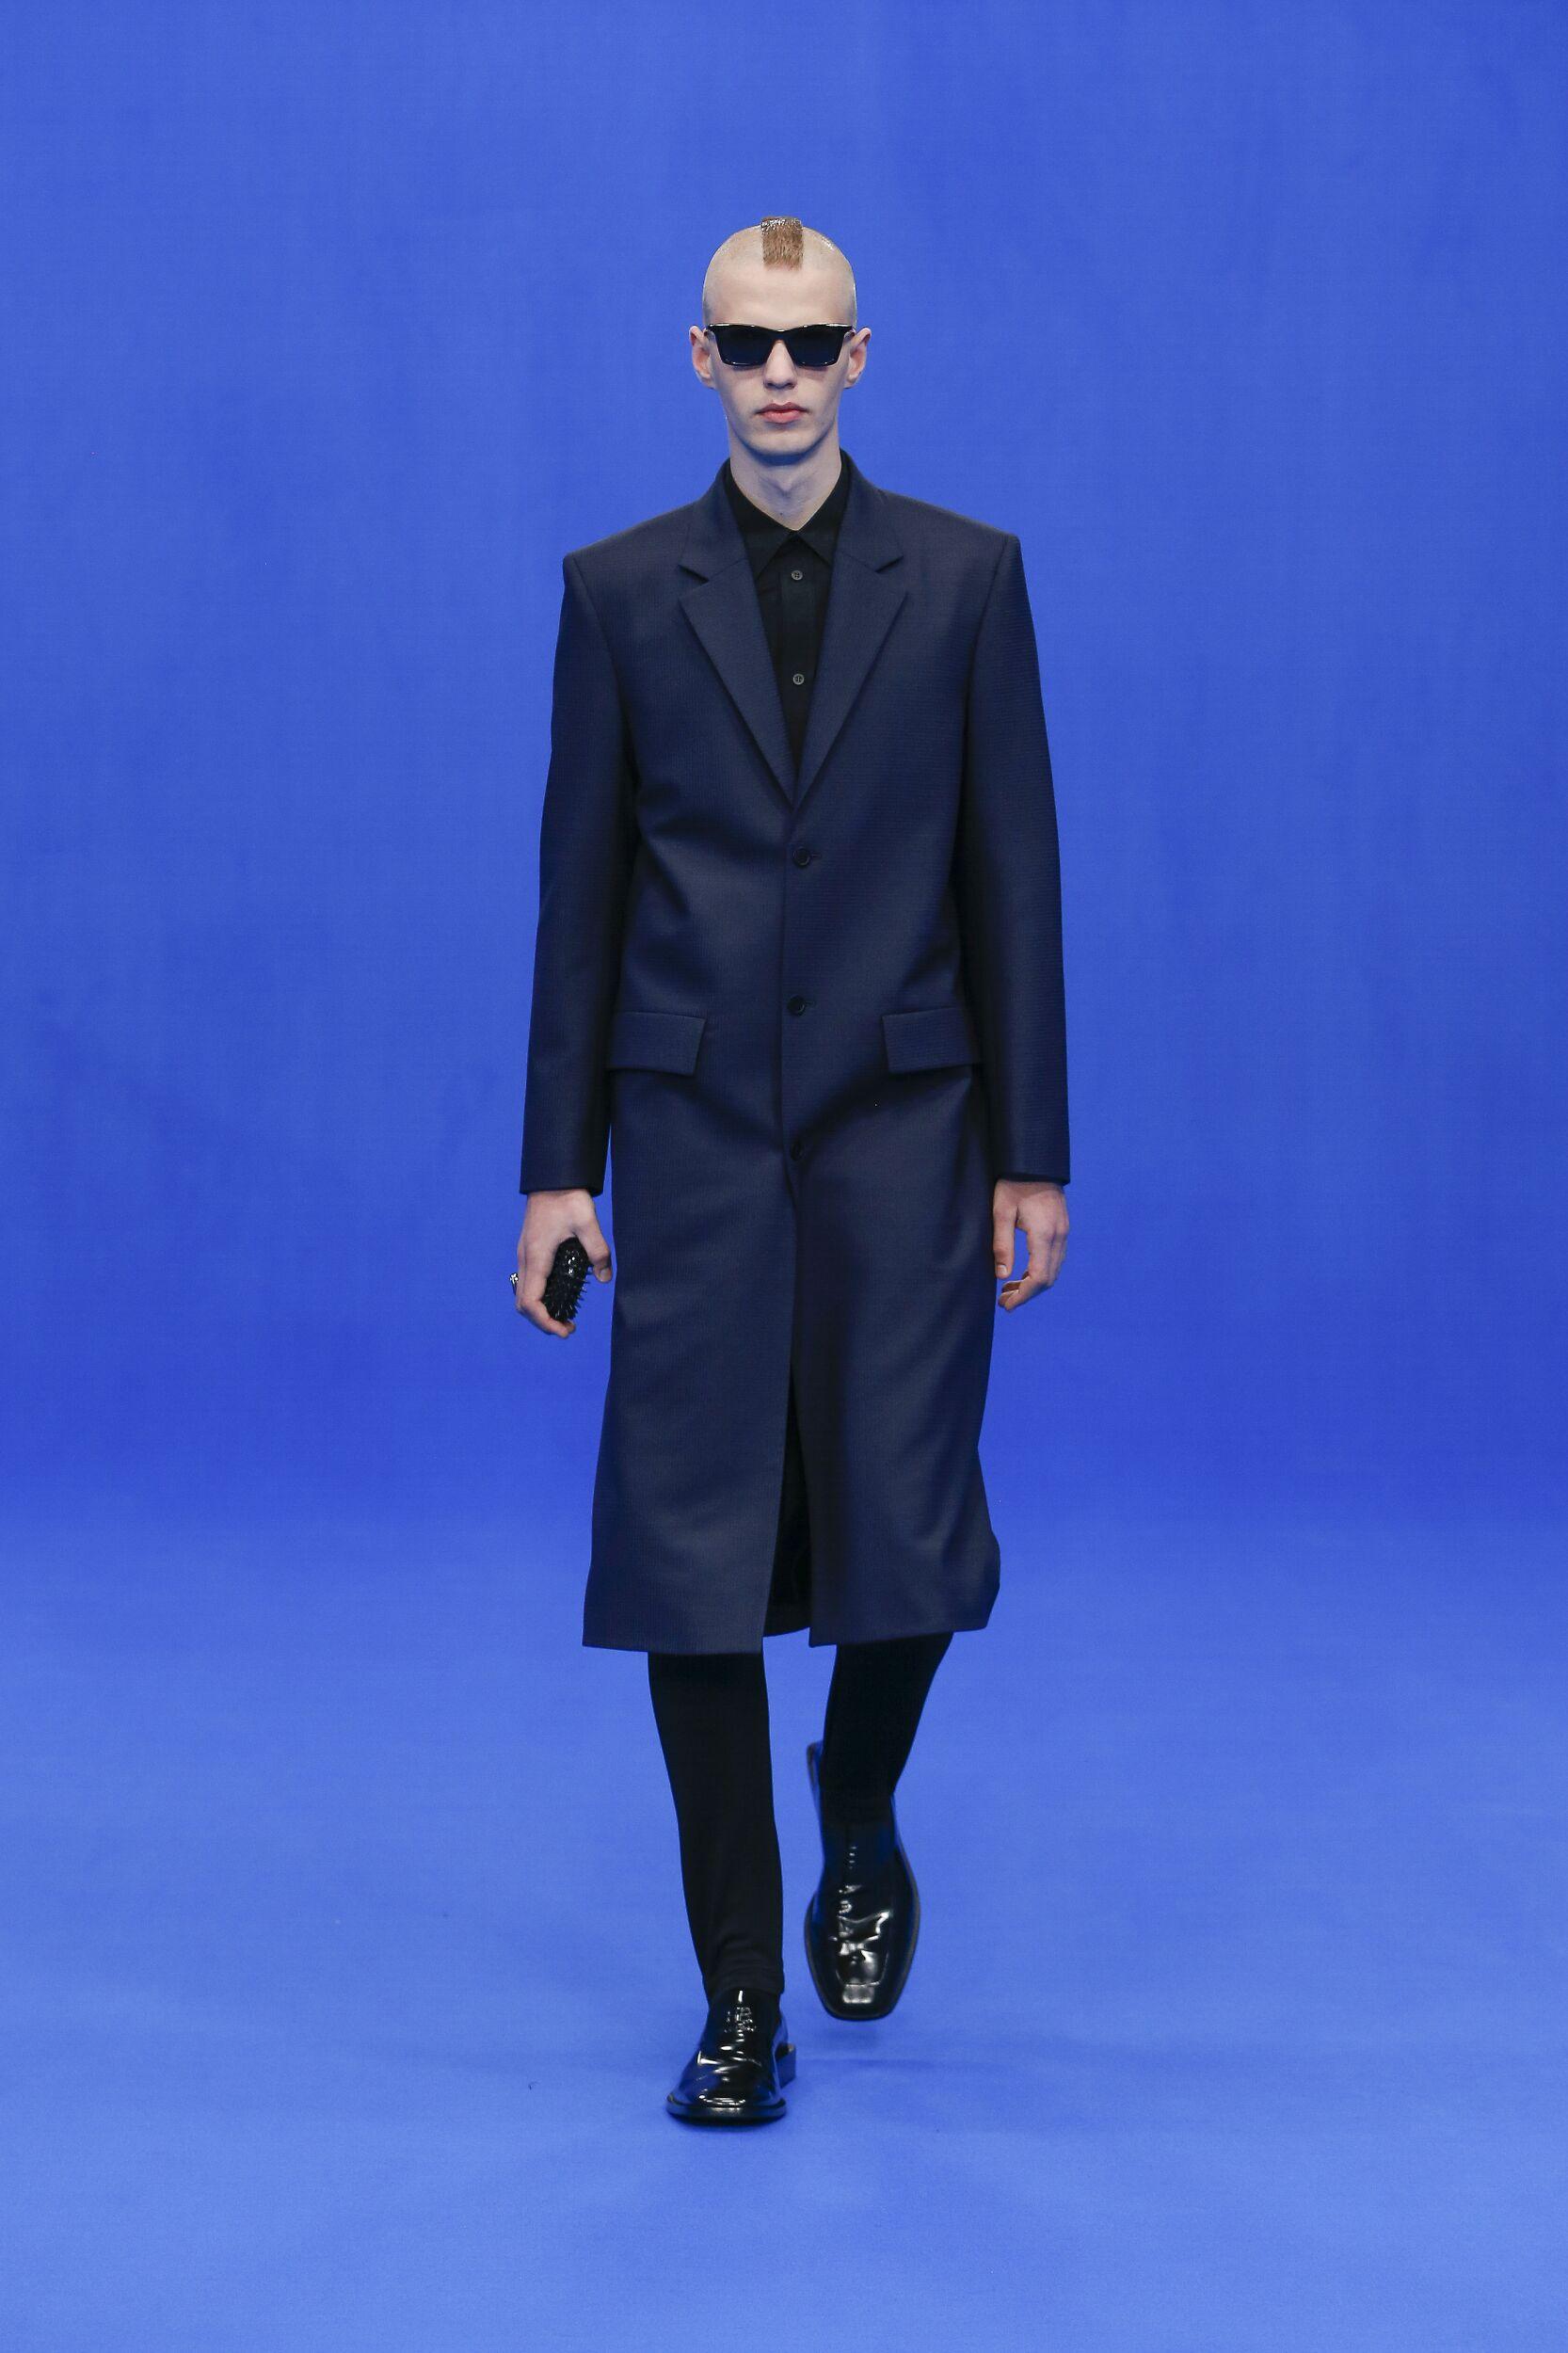 Woman Fashion 2020 Mens Style Balenciaga